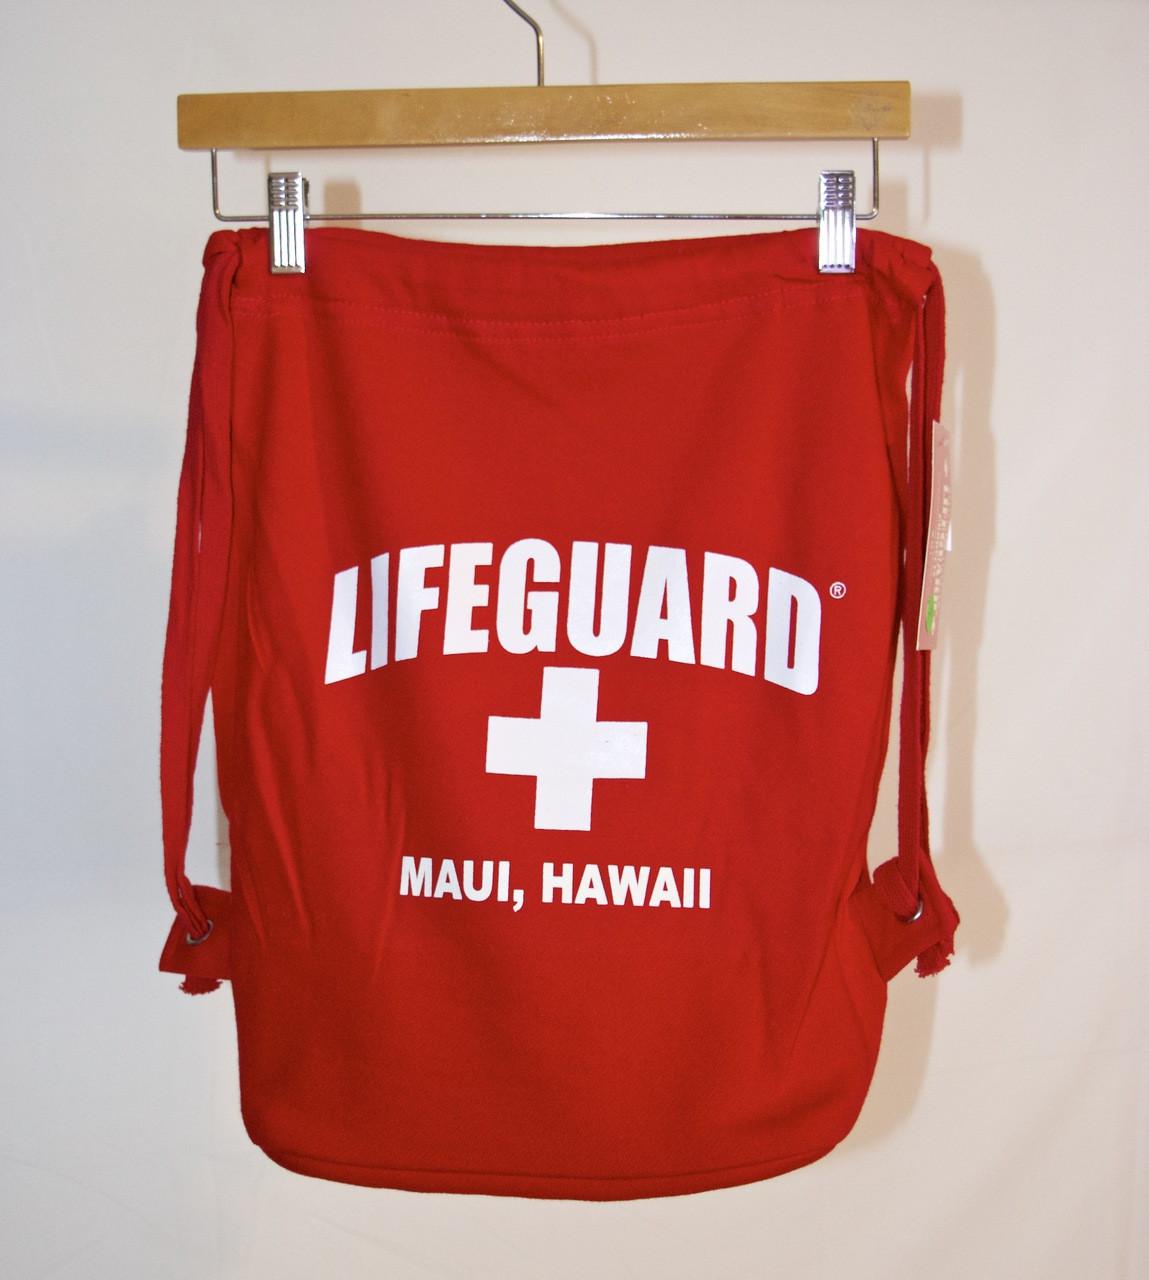 b7a045b2443 Lifeguard Pull-String Backpack - (808)661-7828 Maui s Beach House